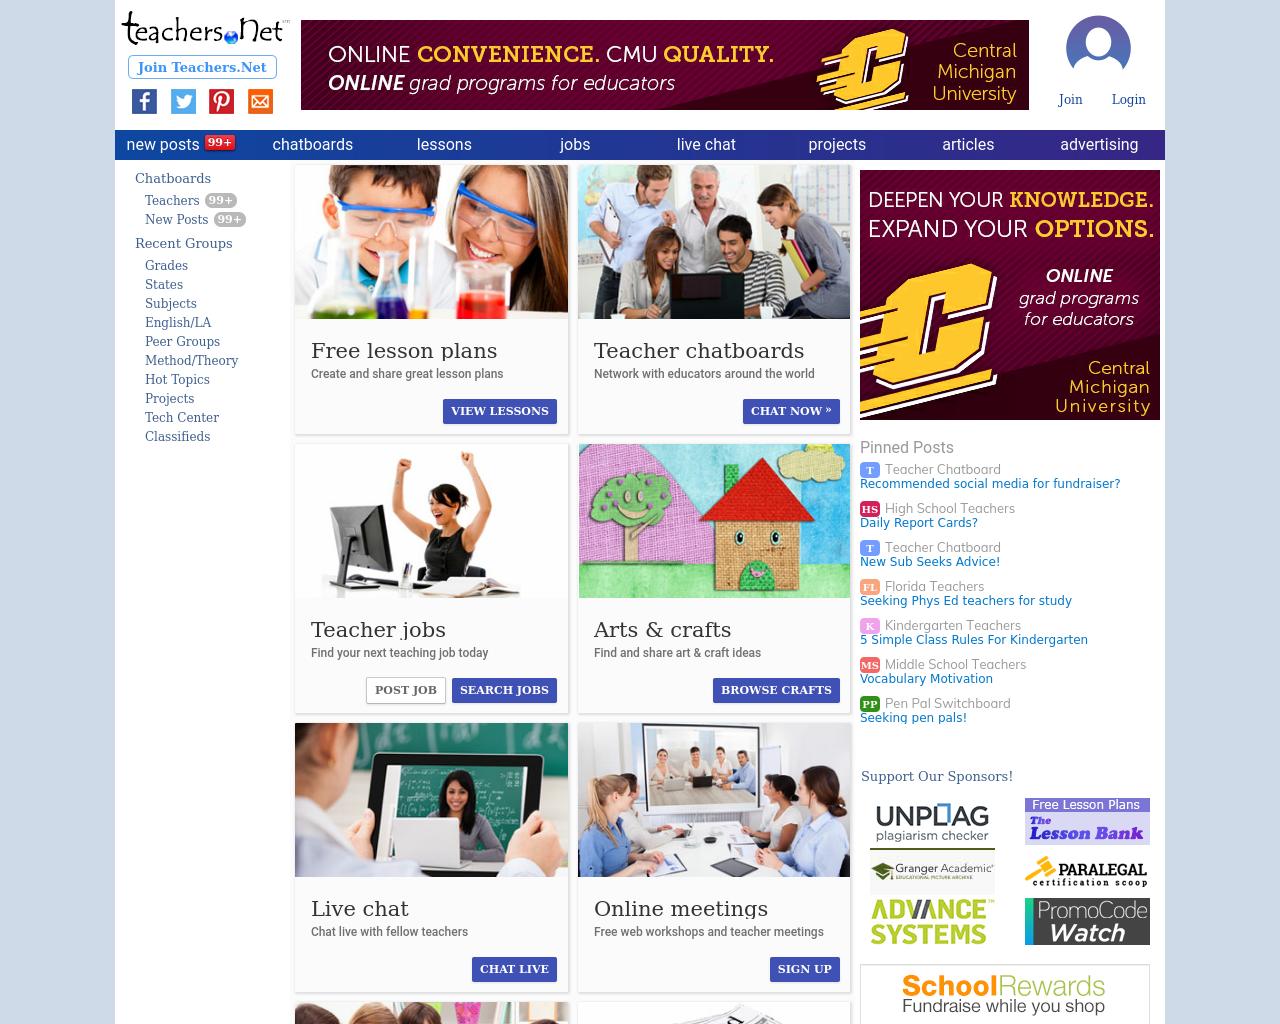 Teachers.net-Advertising-Reviews-Pricing